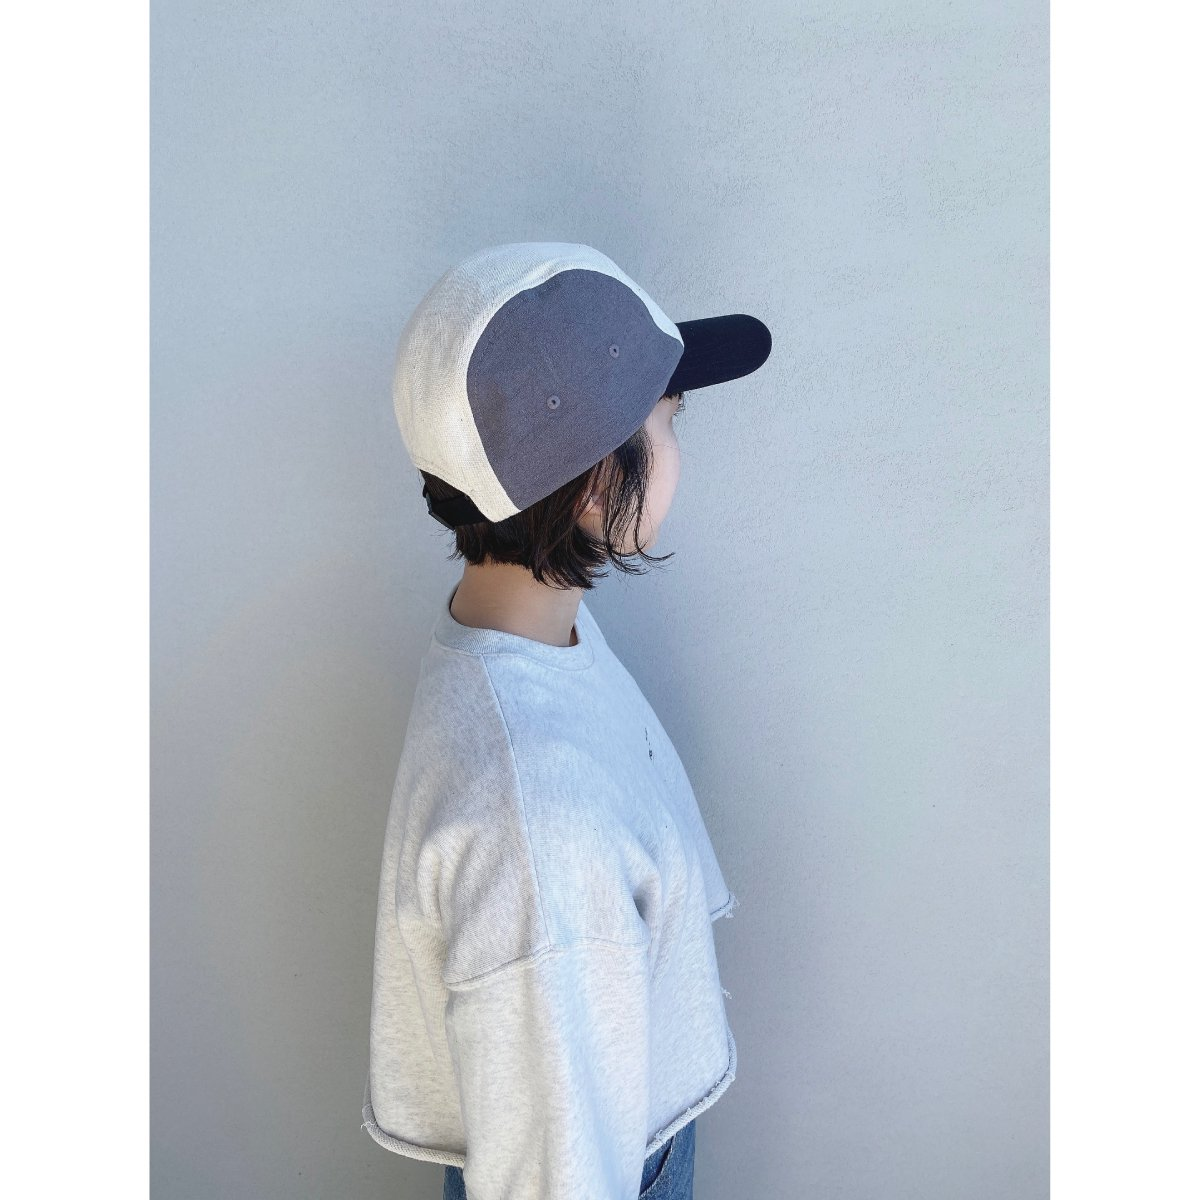 Repro Cap 詳細画像24